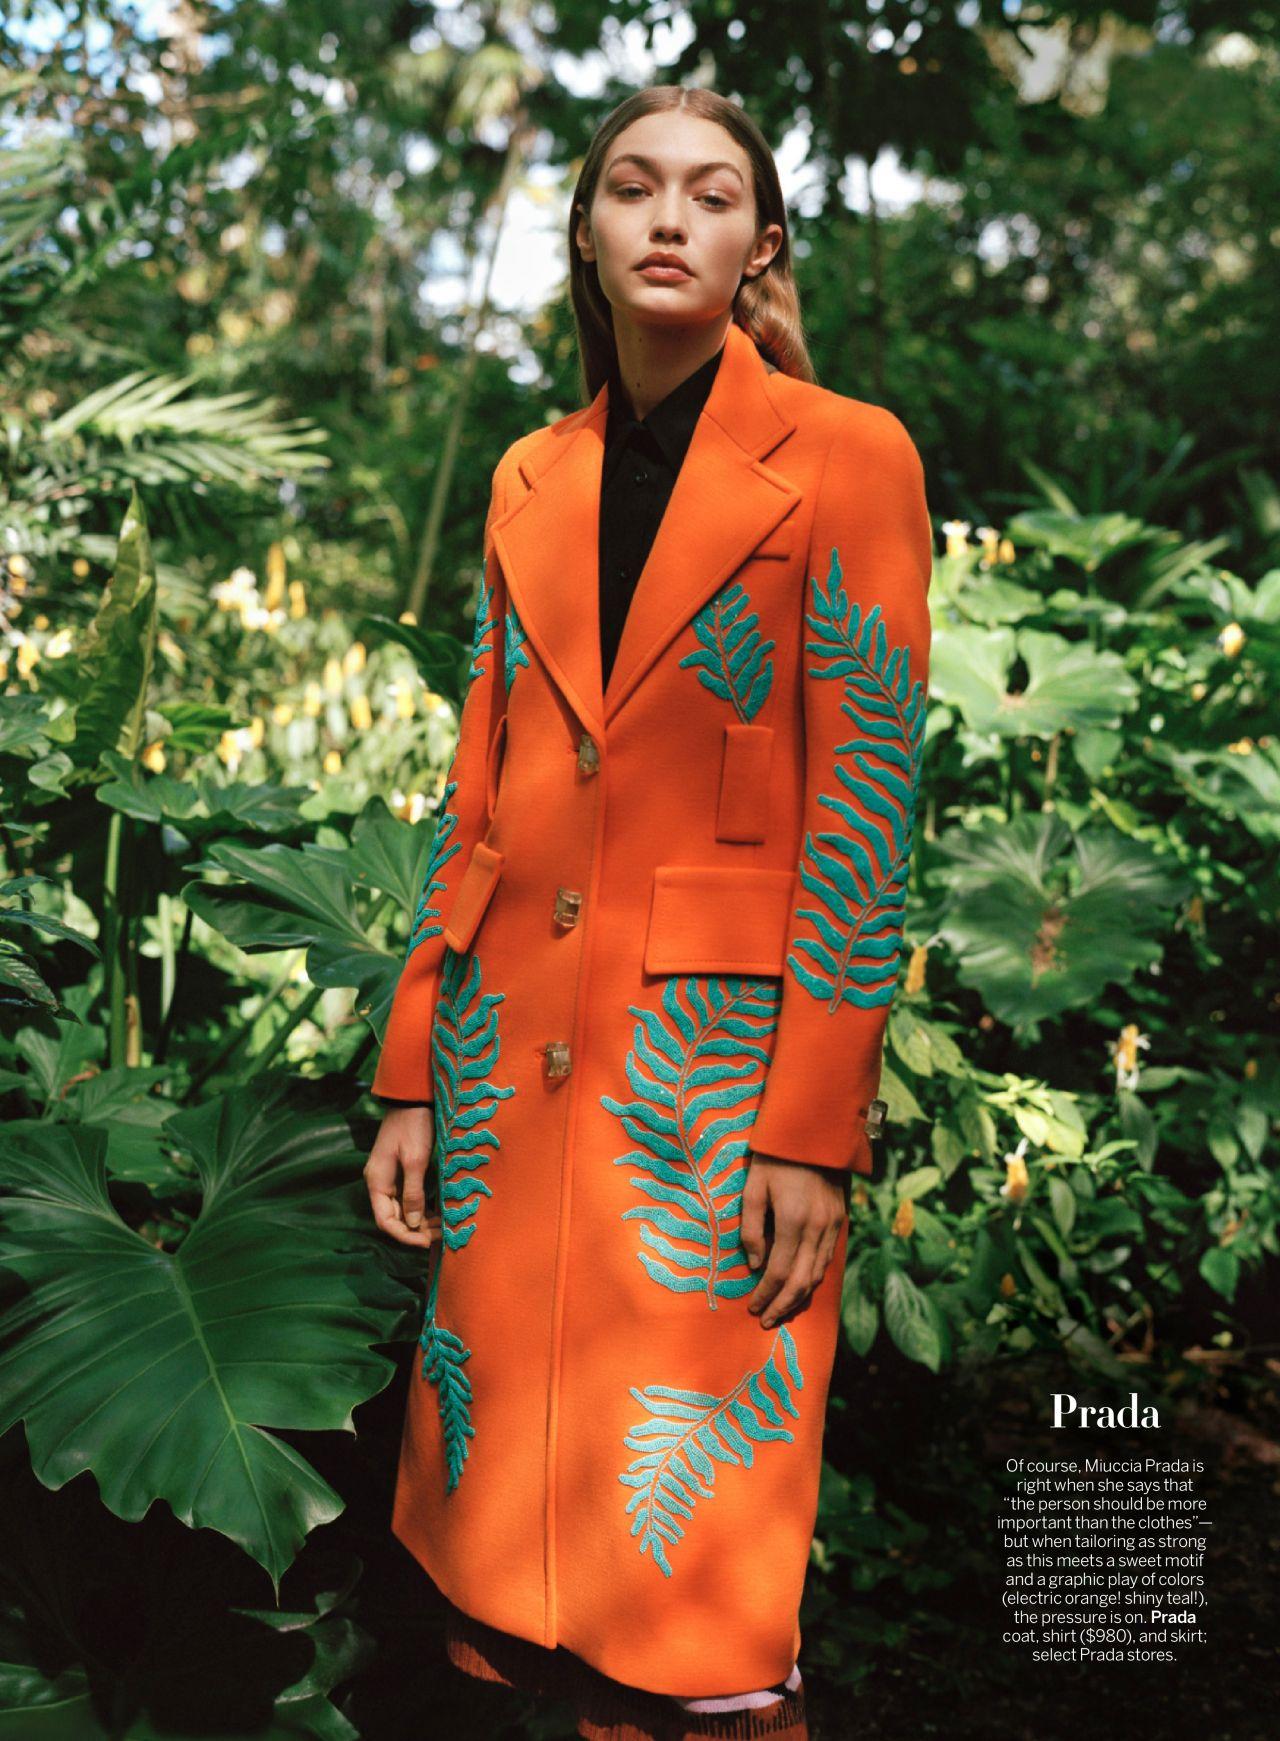 gigi-hadid-in-prada-vogue-magazine-january-2020-issue